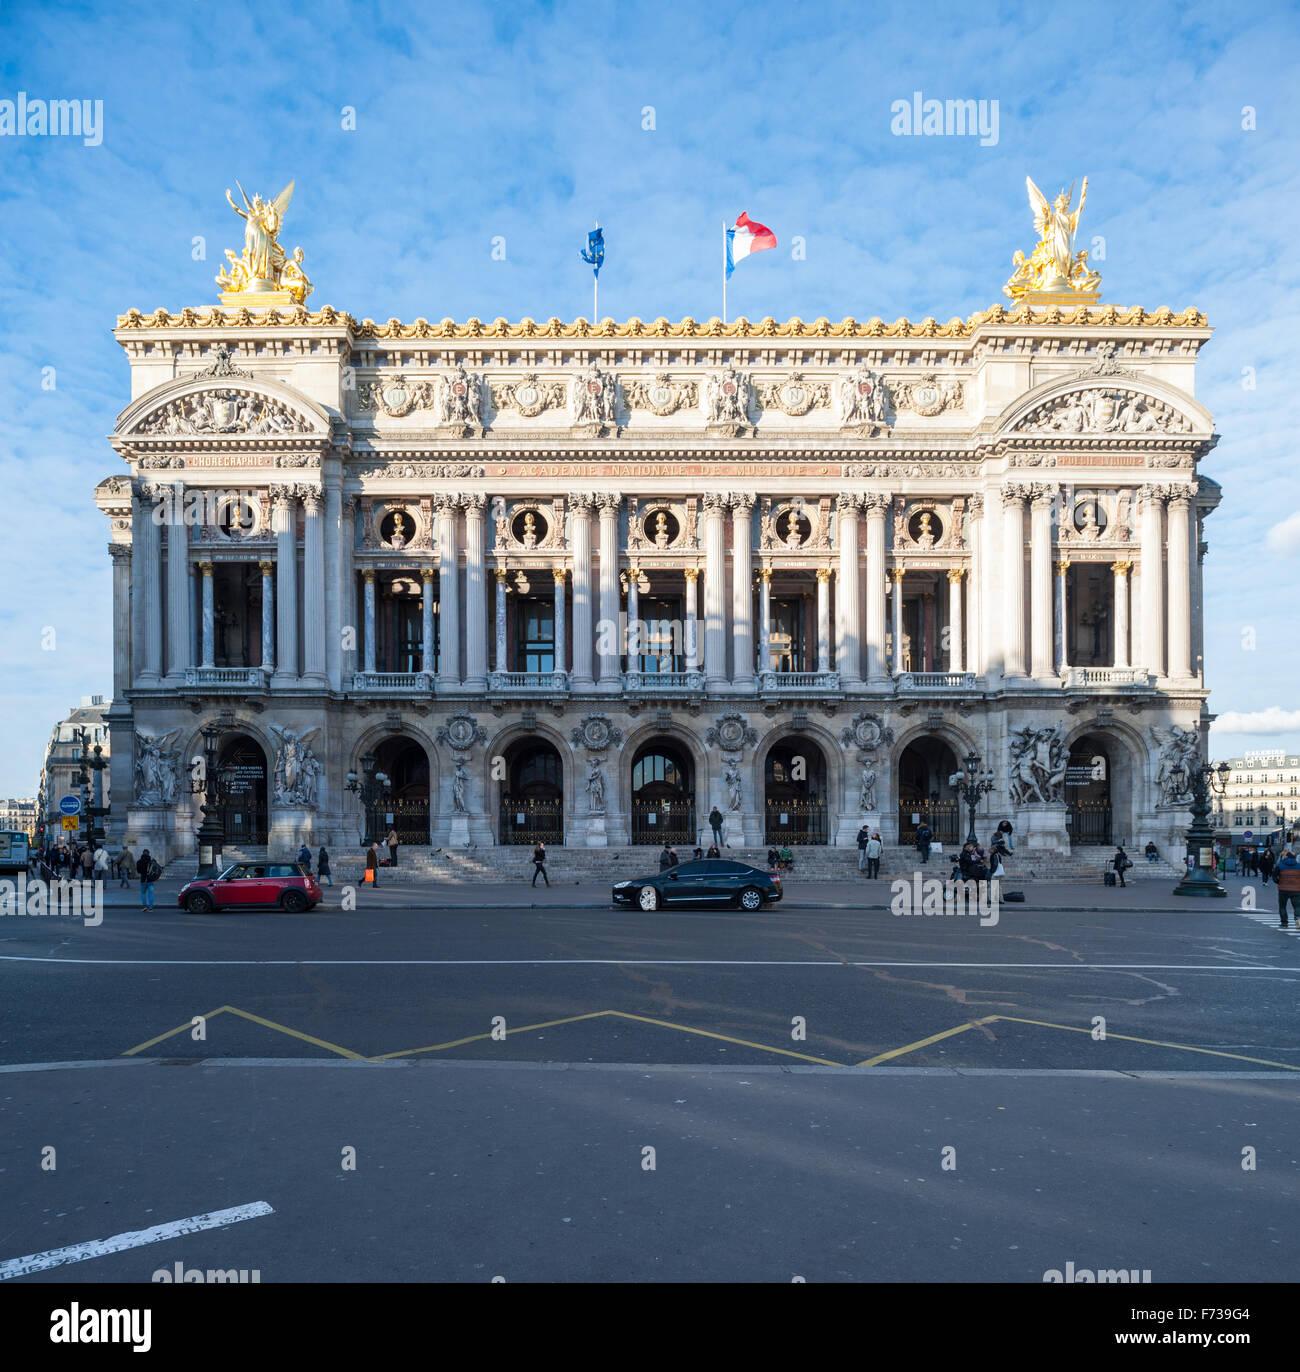 France, Paris, Palais garnier opera house - Stock Image